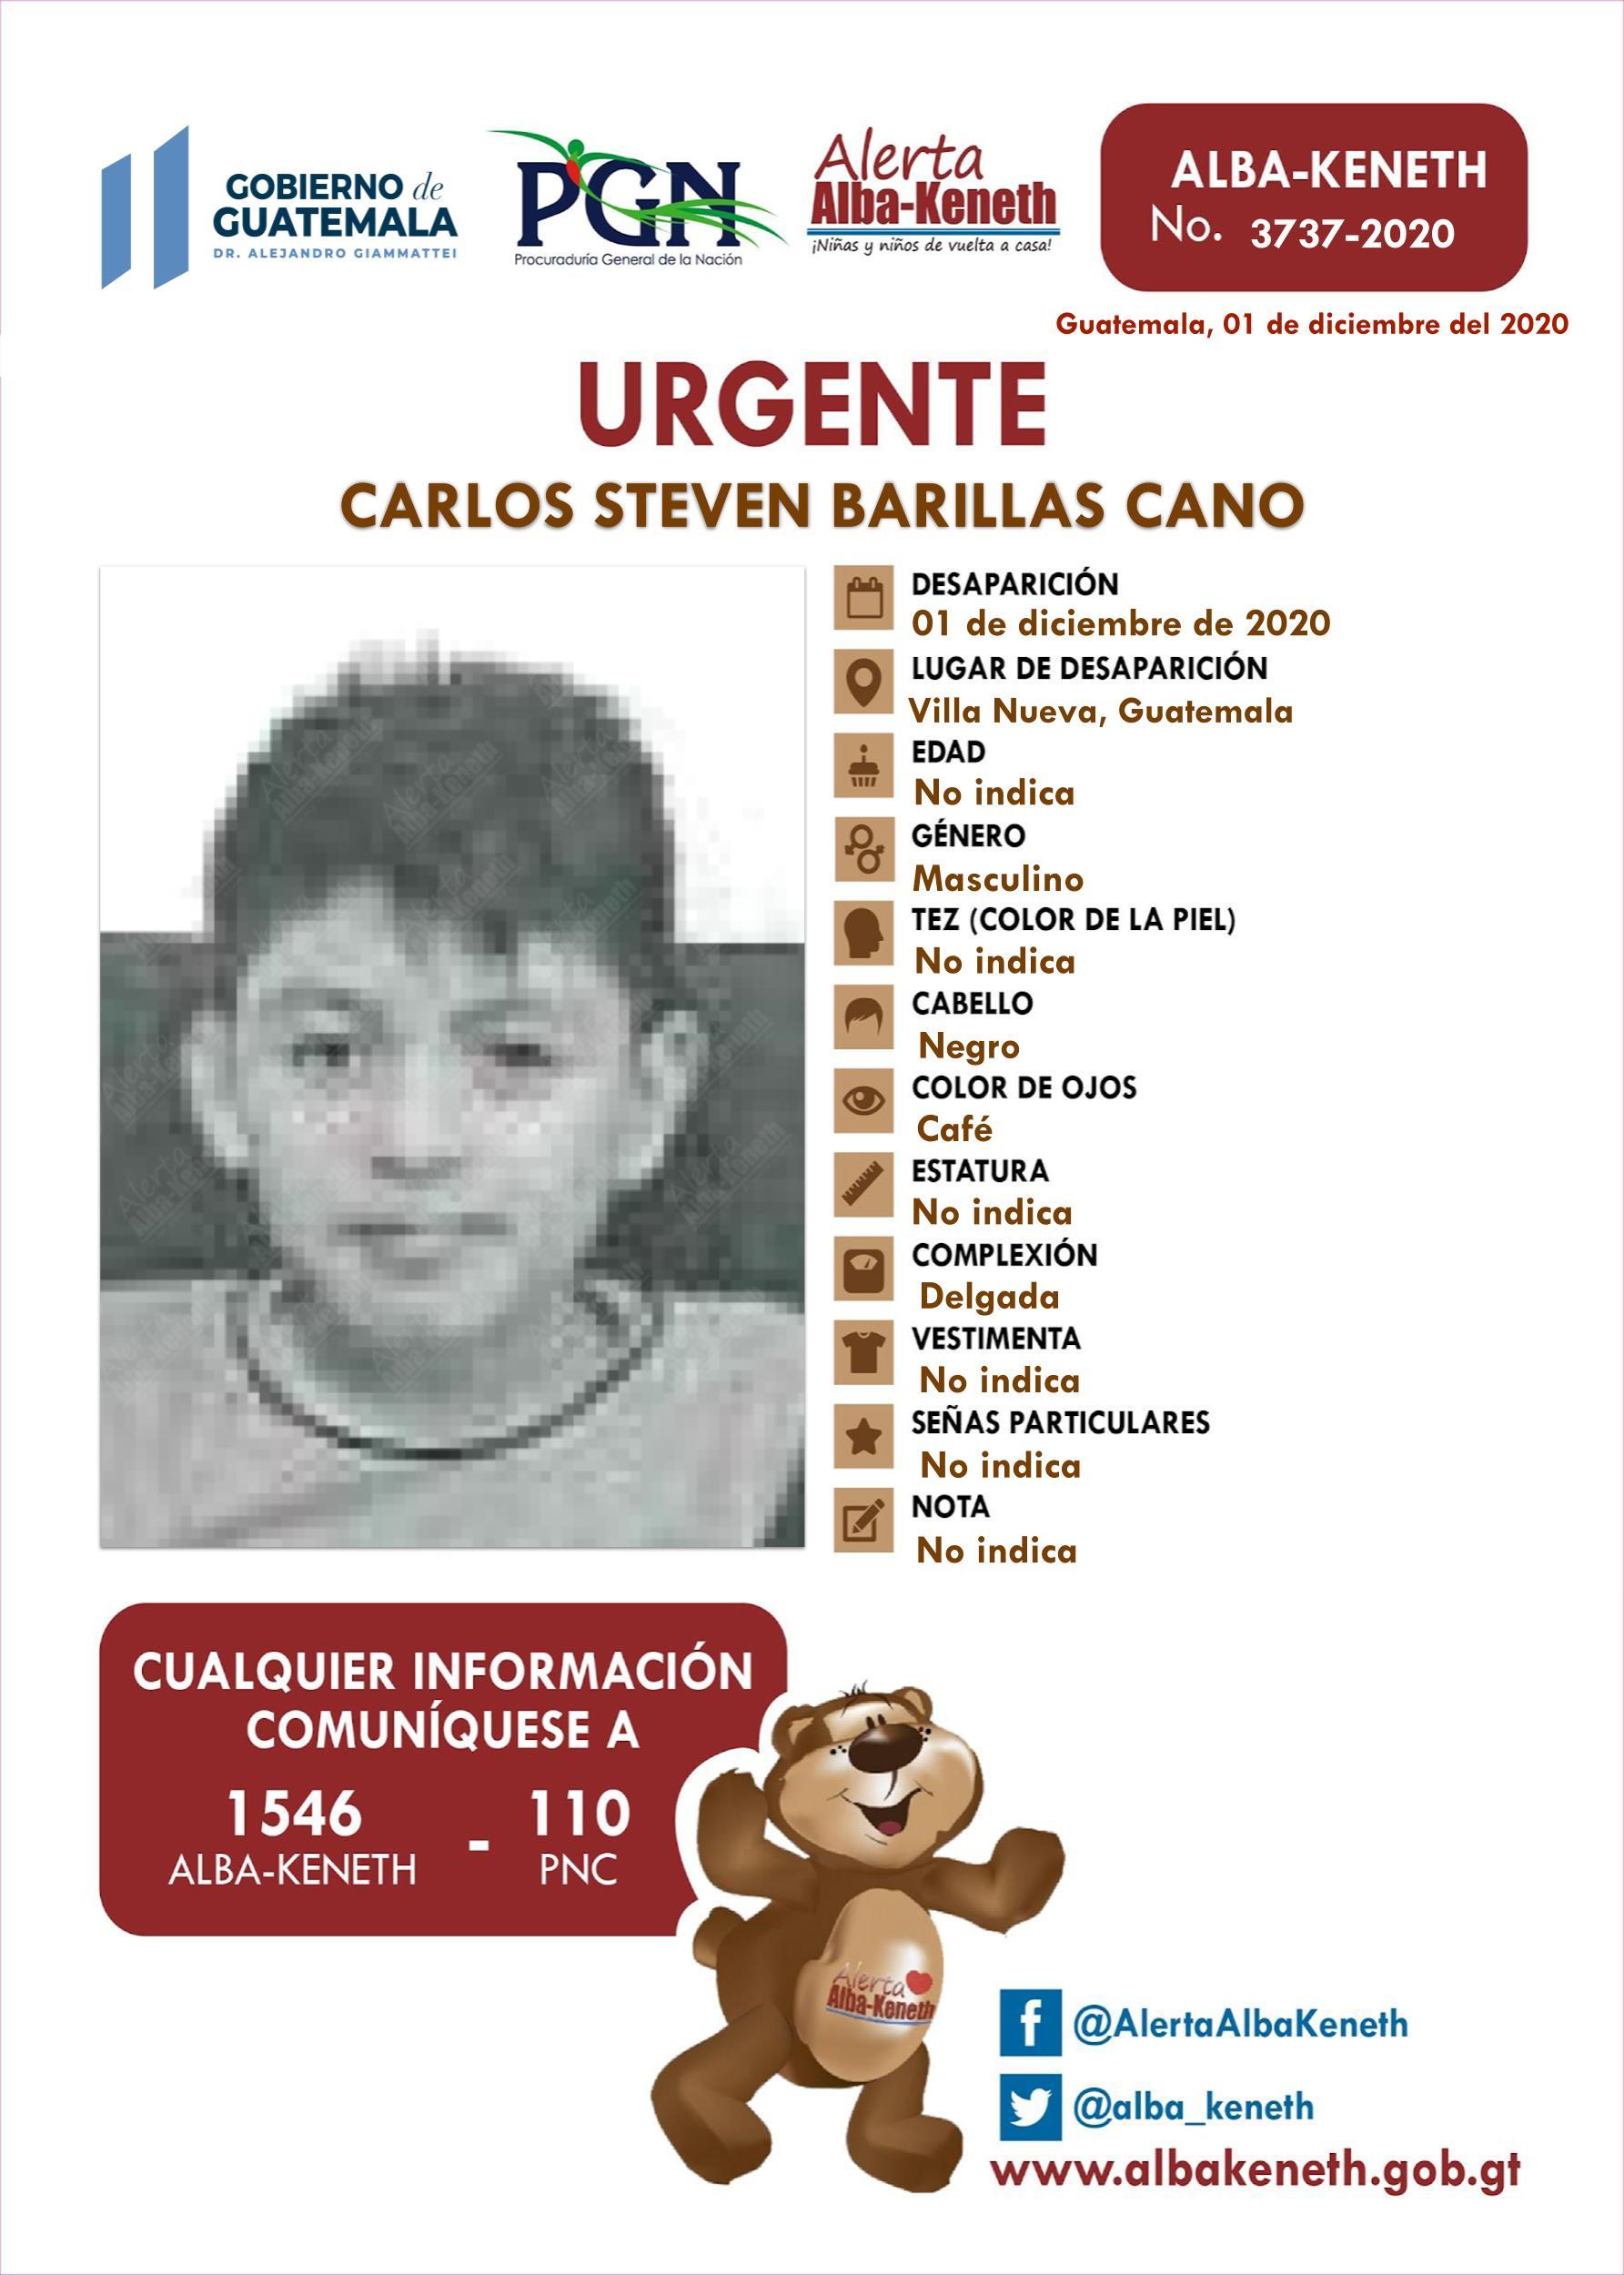 Carlos Steven Barillas Cano